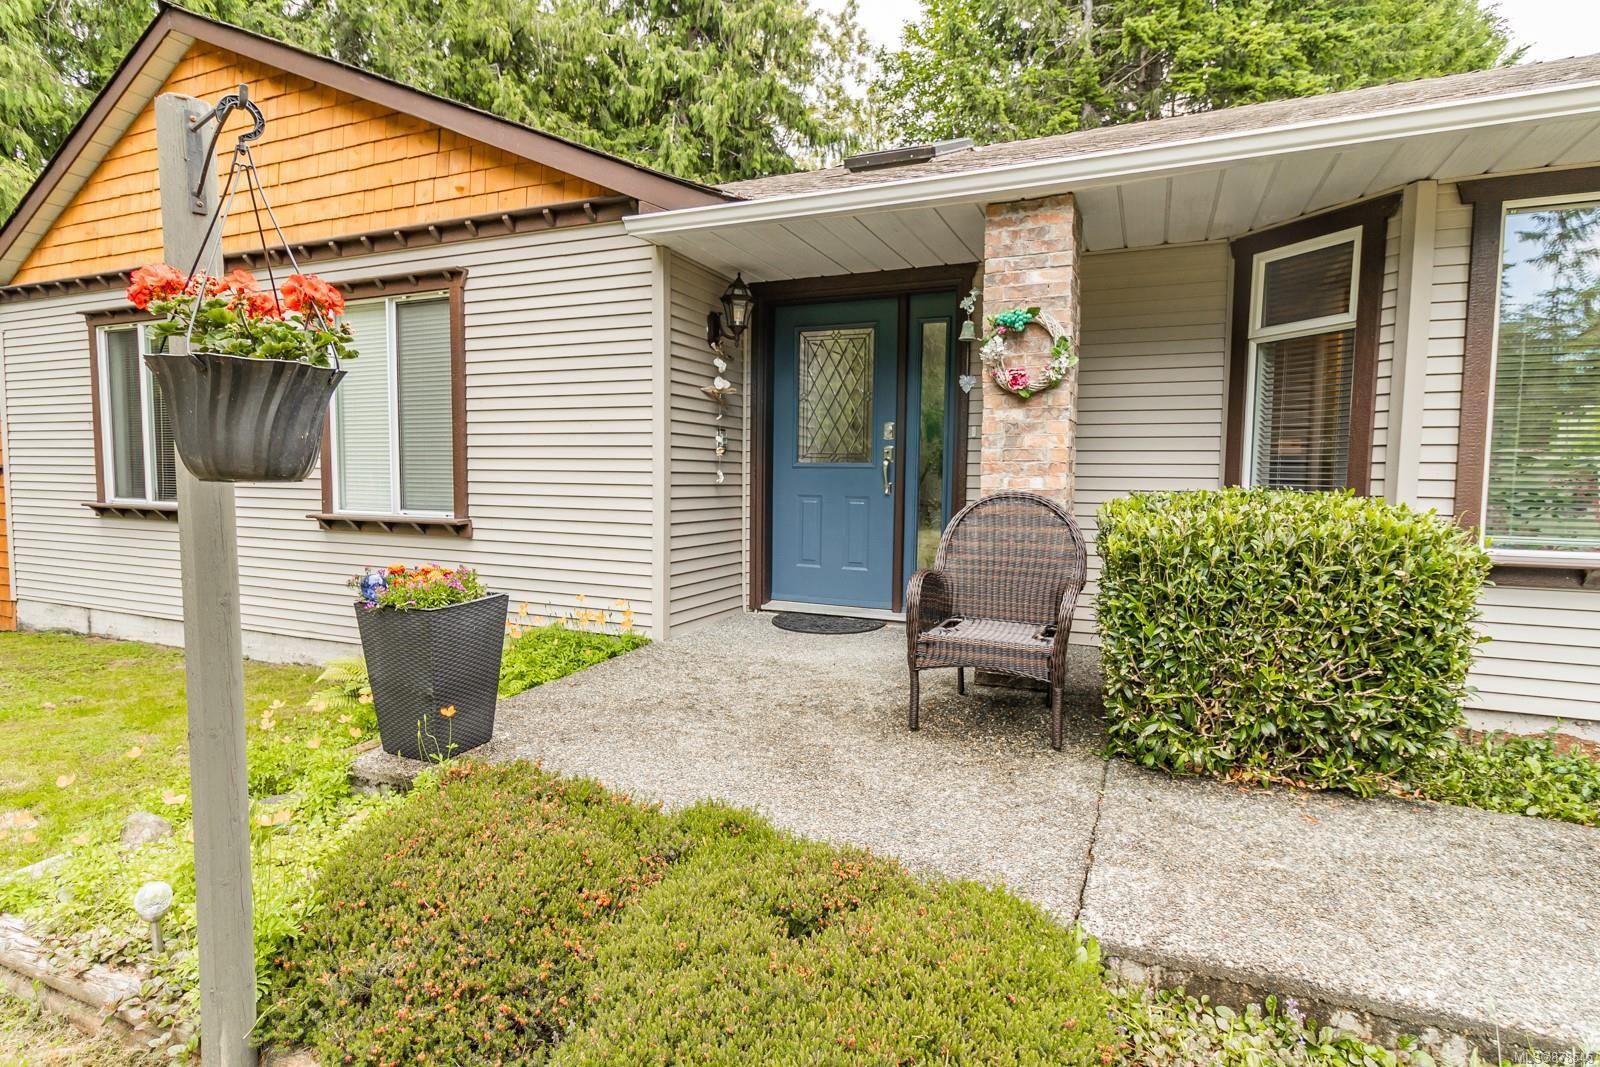 Photo 11: Photos: 1070 Symons Cres in : PQ Qualicum Beach House for sale (Parksville/Qualicum)  : MLS®# 878545